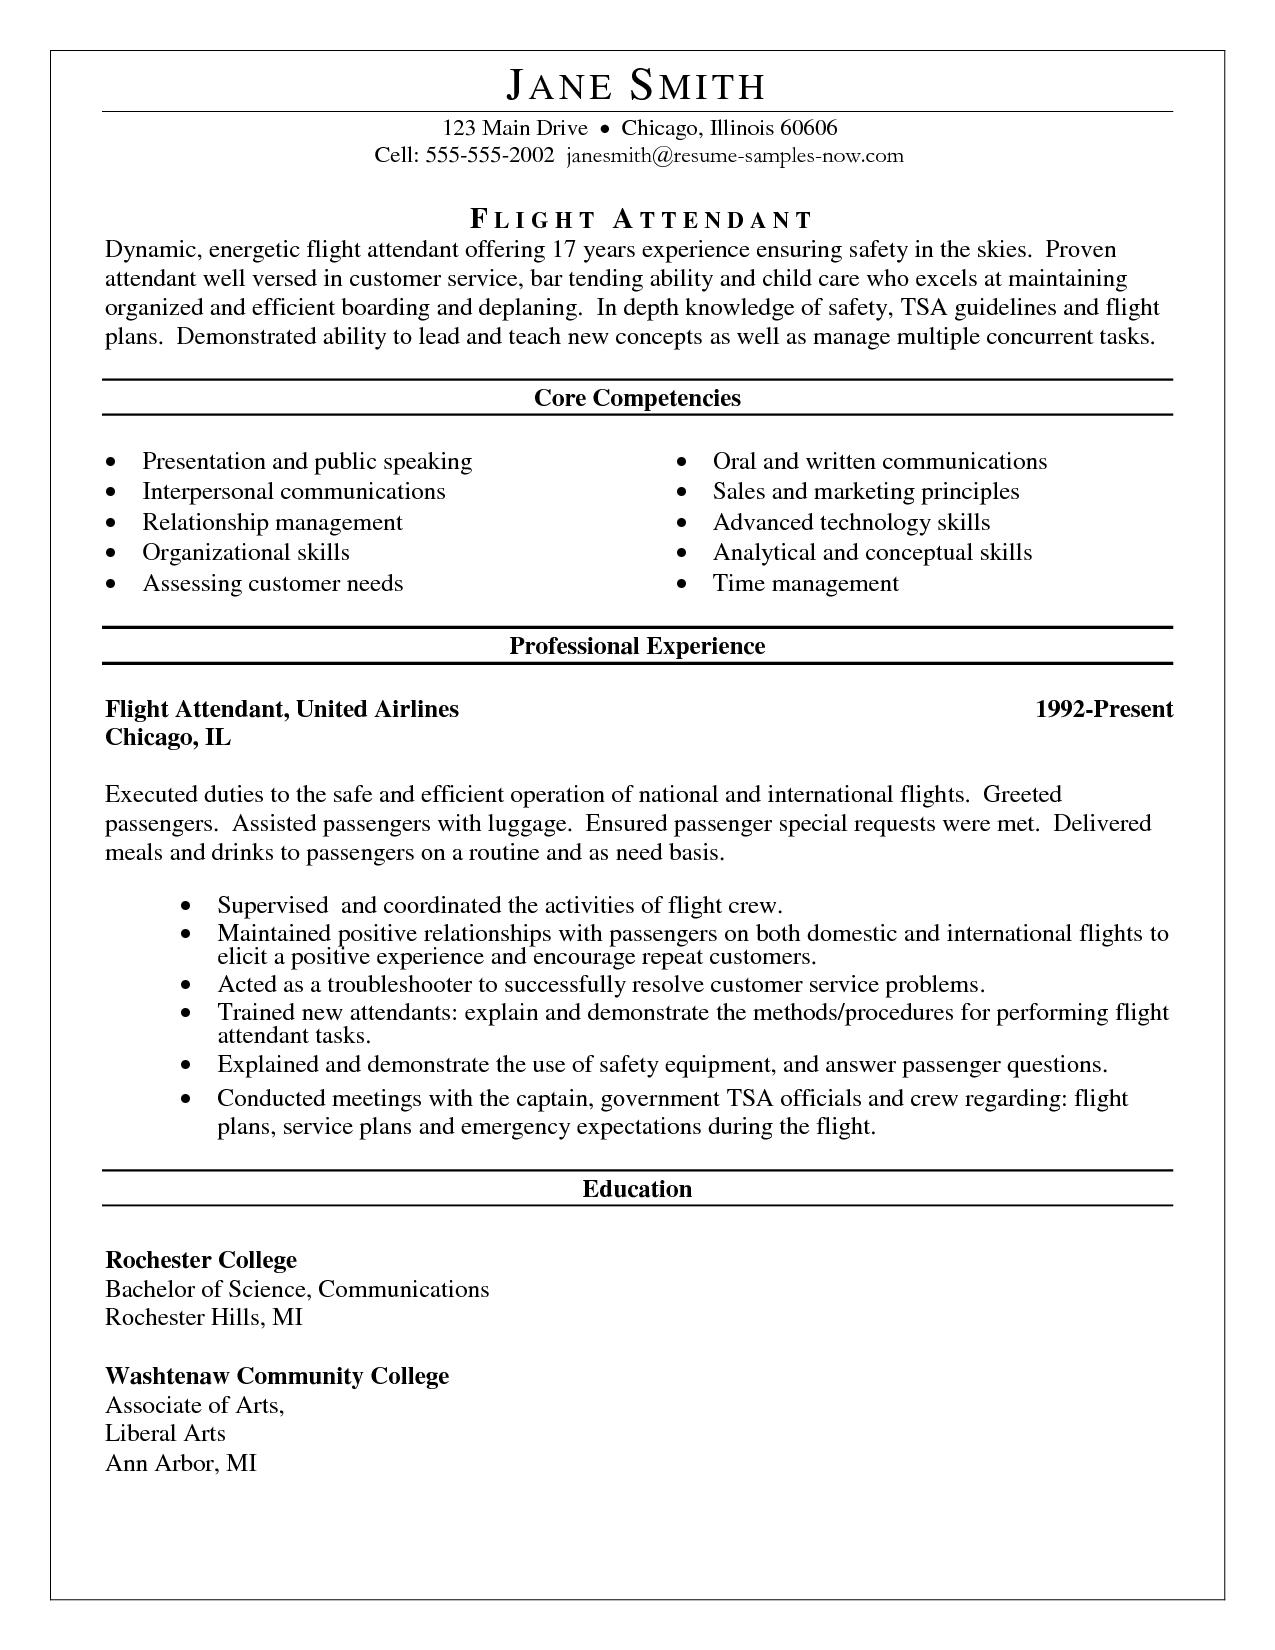 Core Competencies Resume Flight attendant resume, Resume